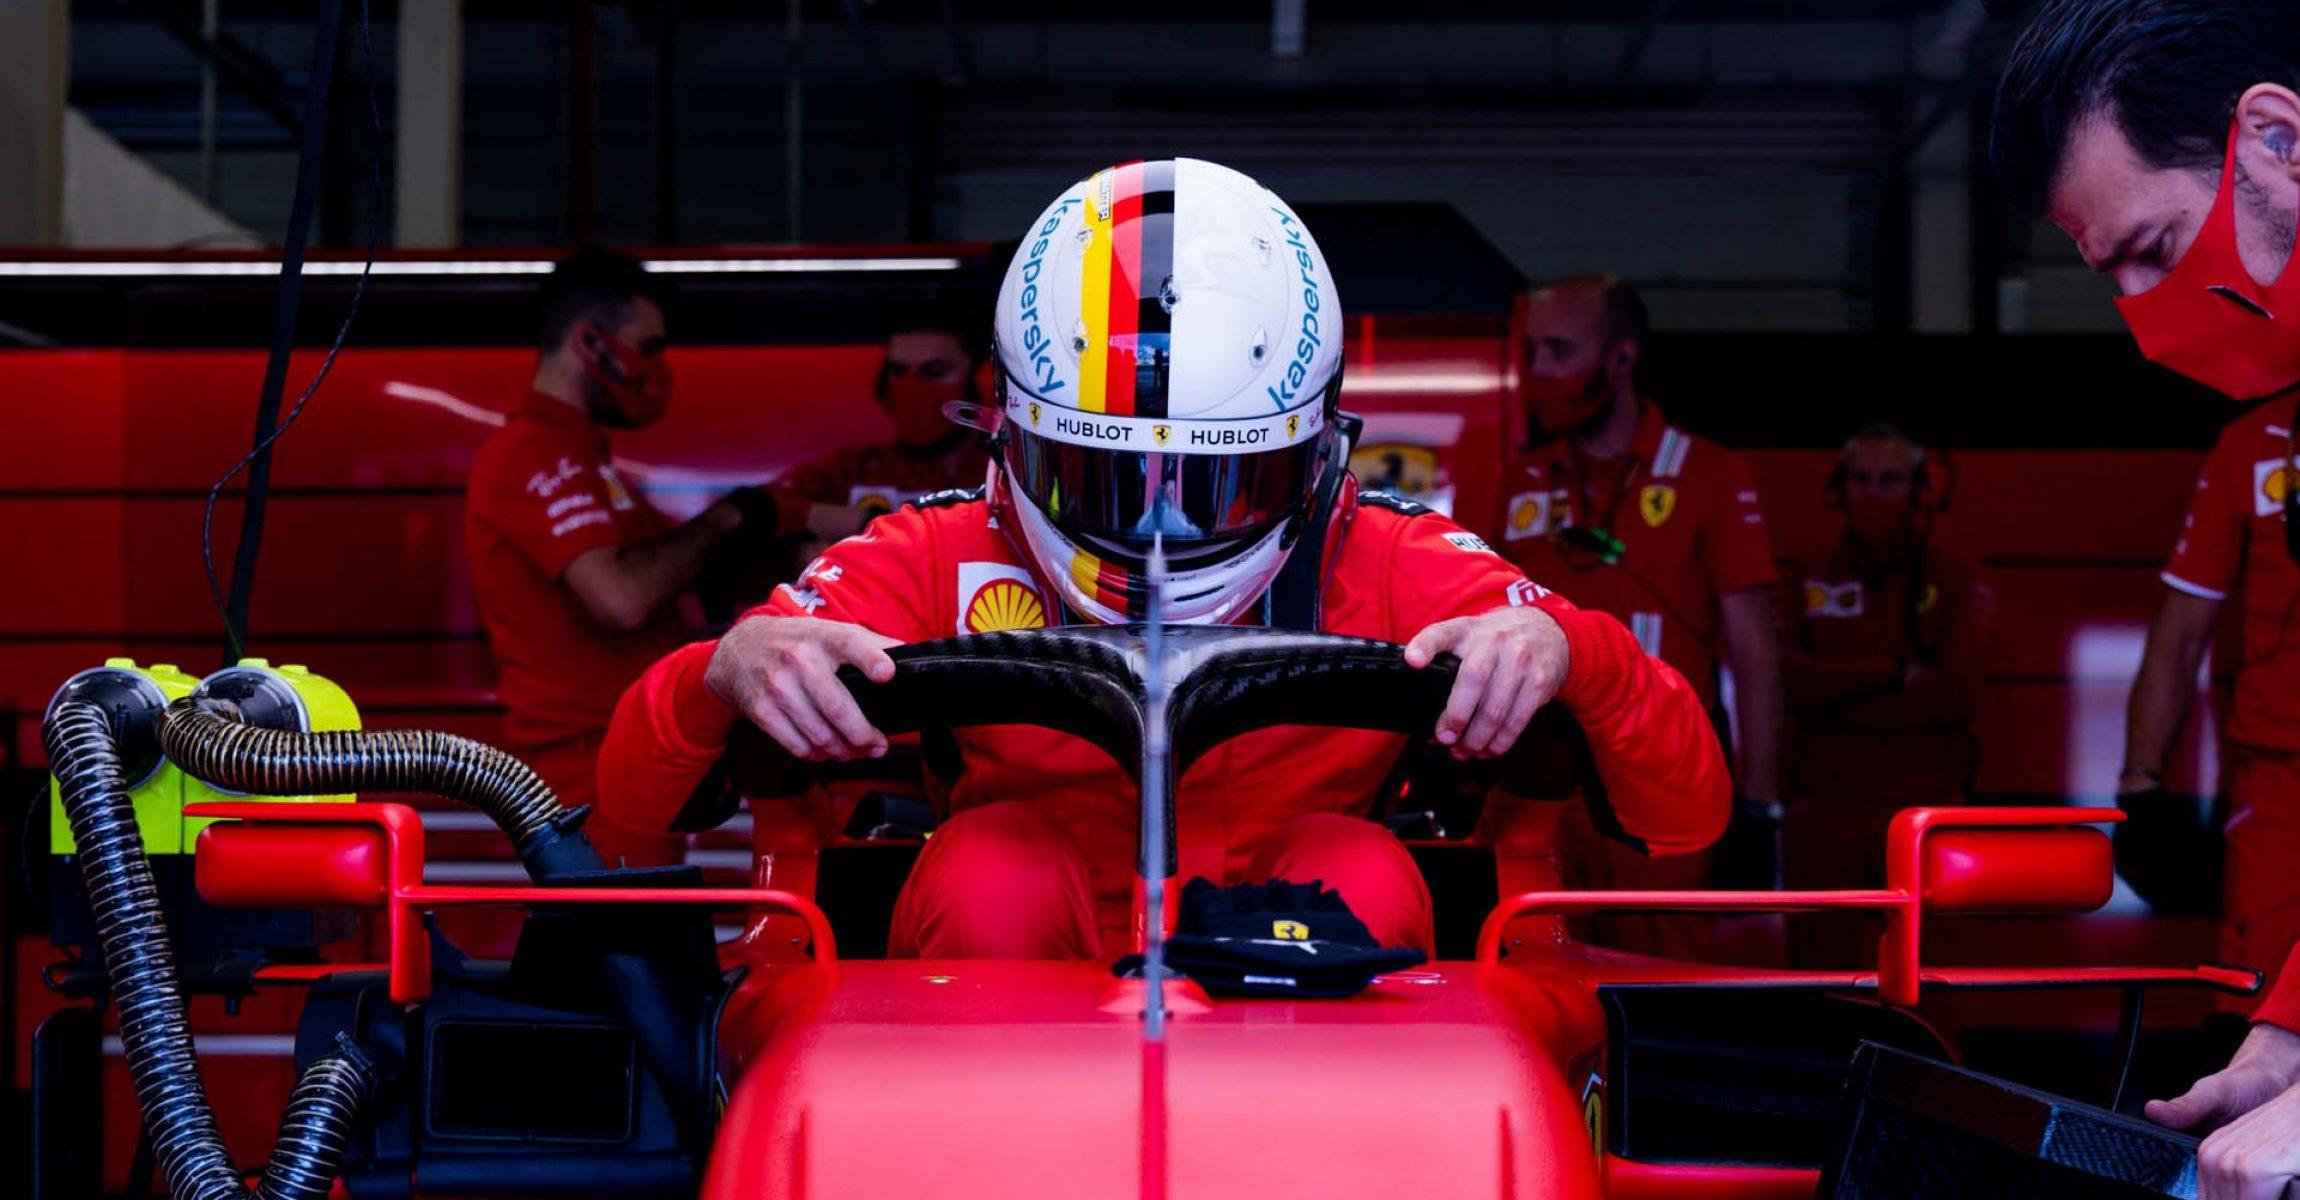 GP GRAN BRETAGNA F1/2020 - SABATO 01/08/2020 credit: @Scuderia Ferrari Press Office Sebastian Vettel